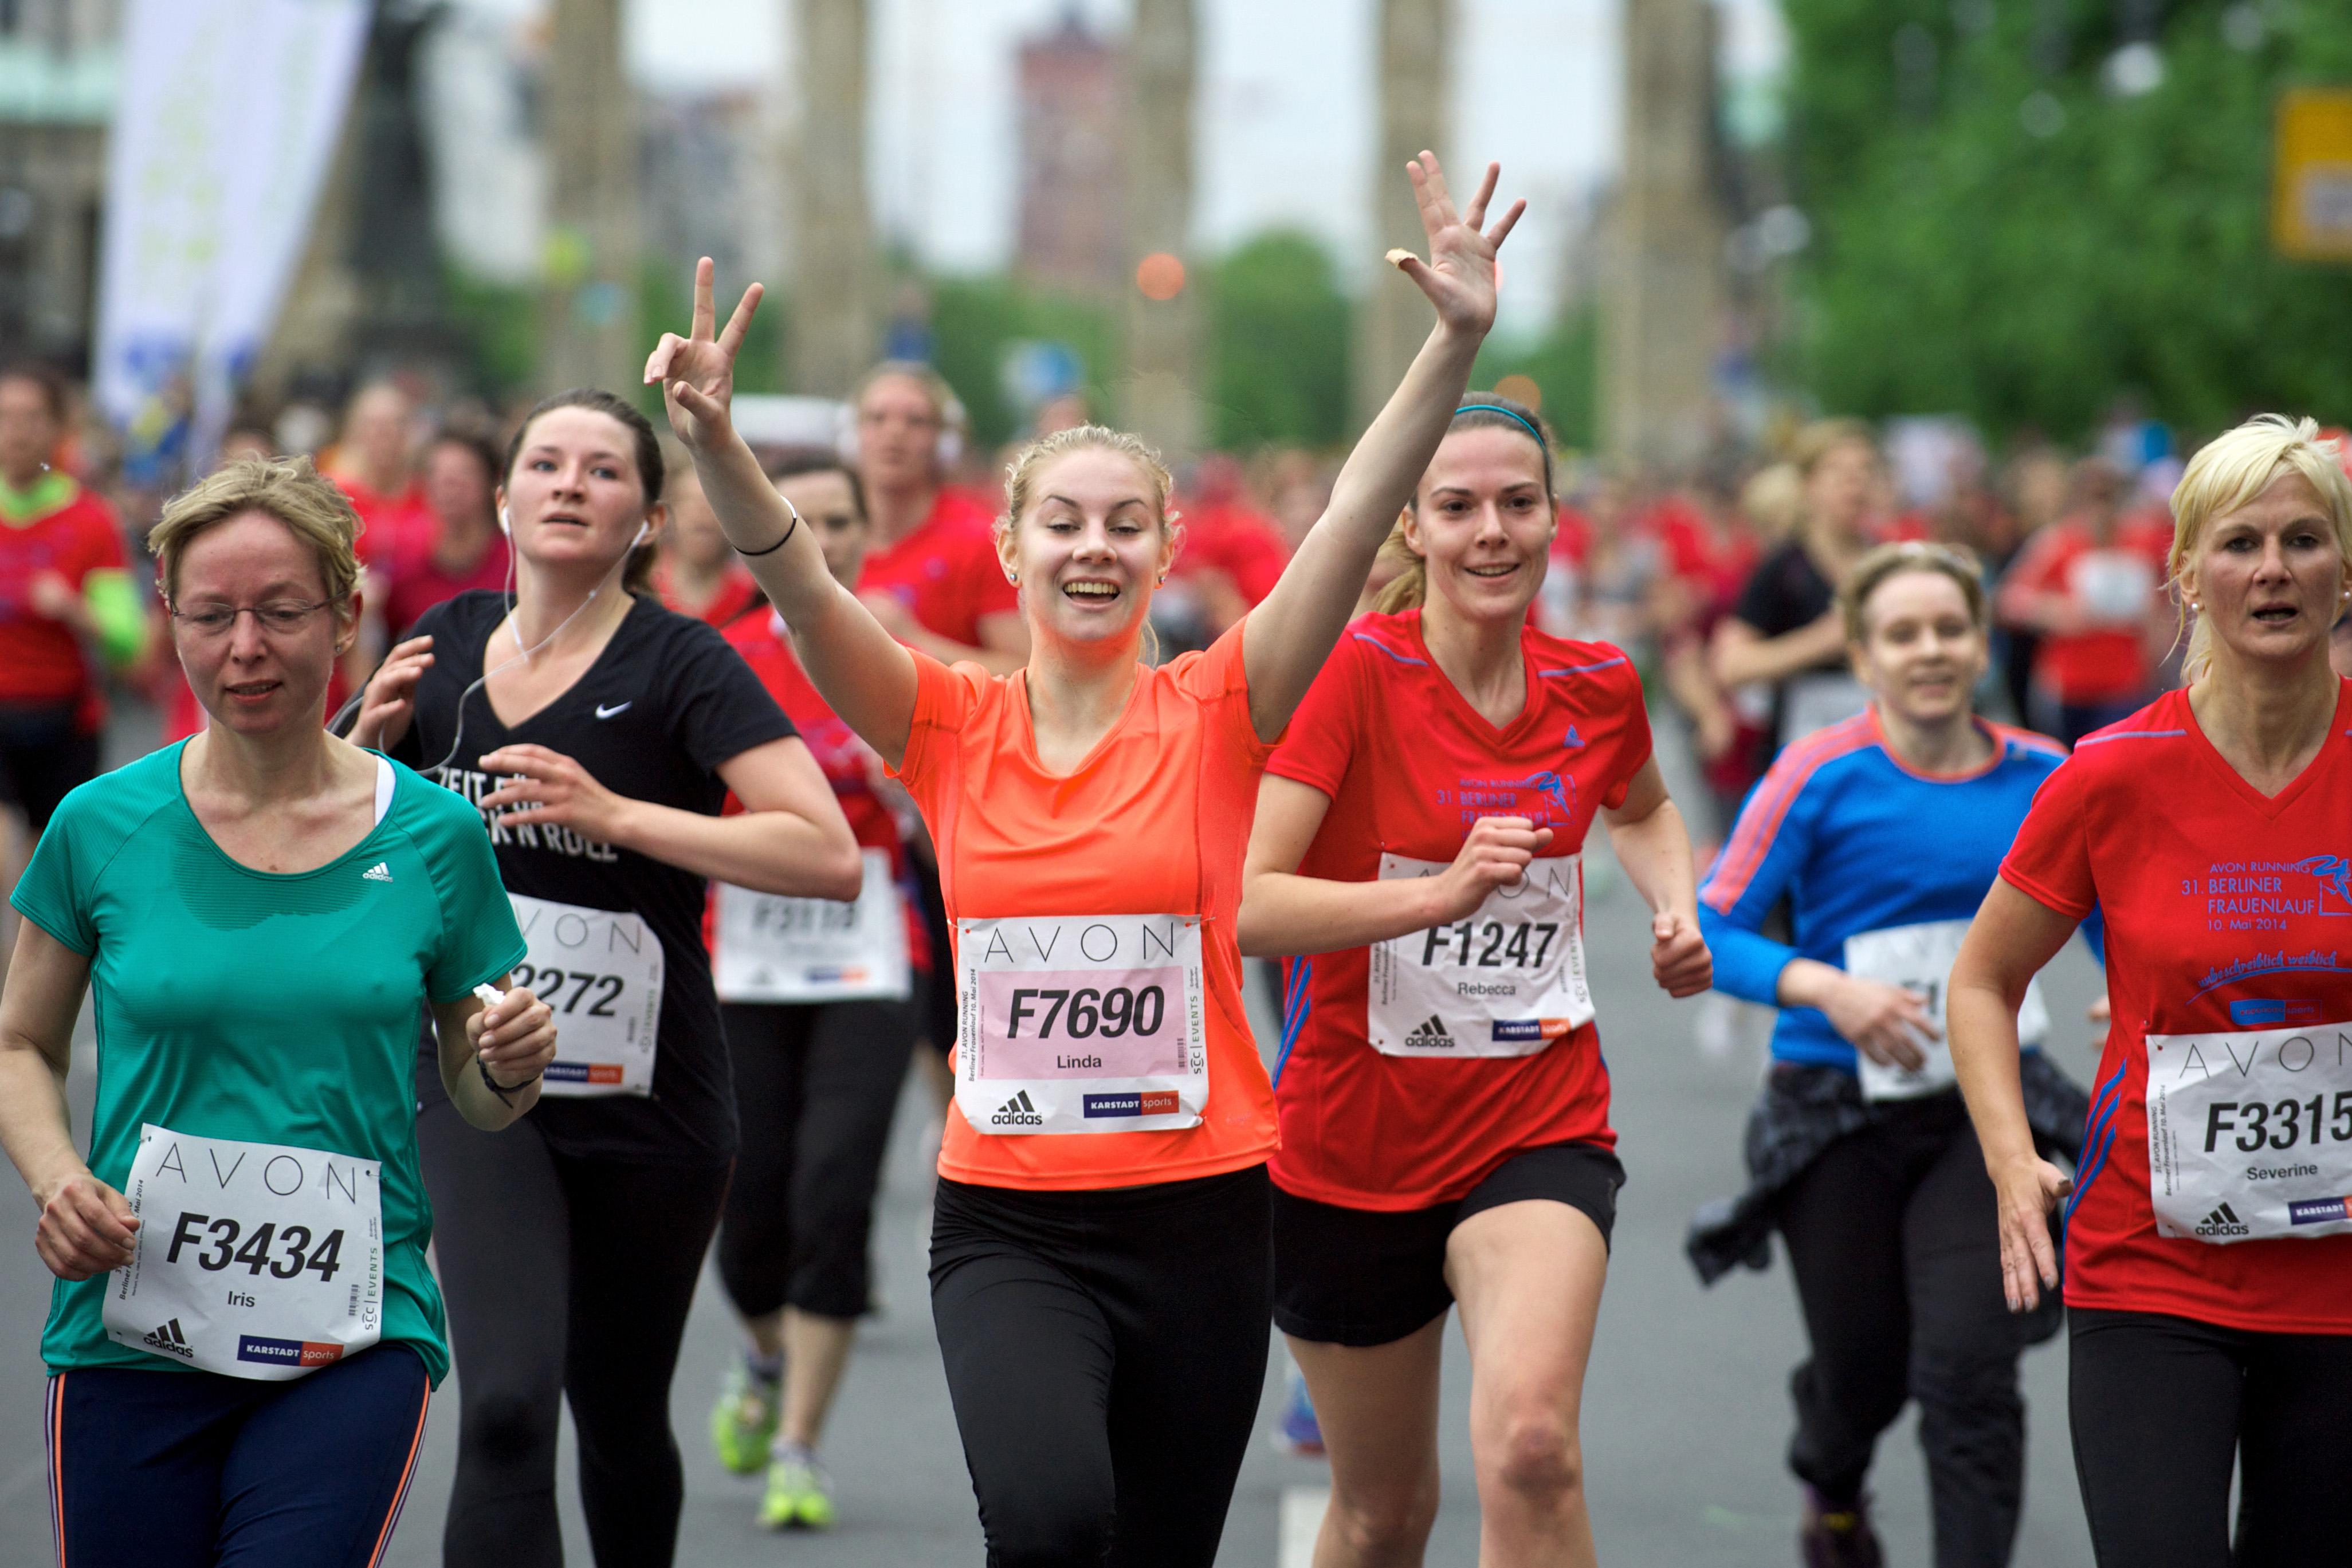 Leichathletik   Berlin                                           10.05.2014 AVON Running 31 Berliner Frauenlauf Foto Camera 4